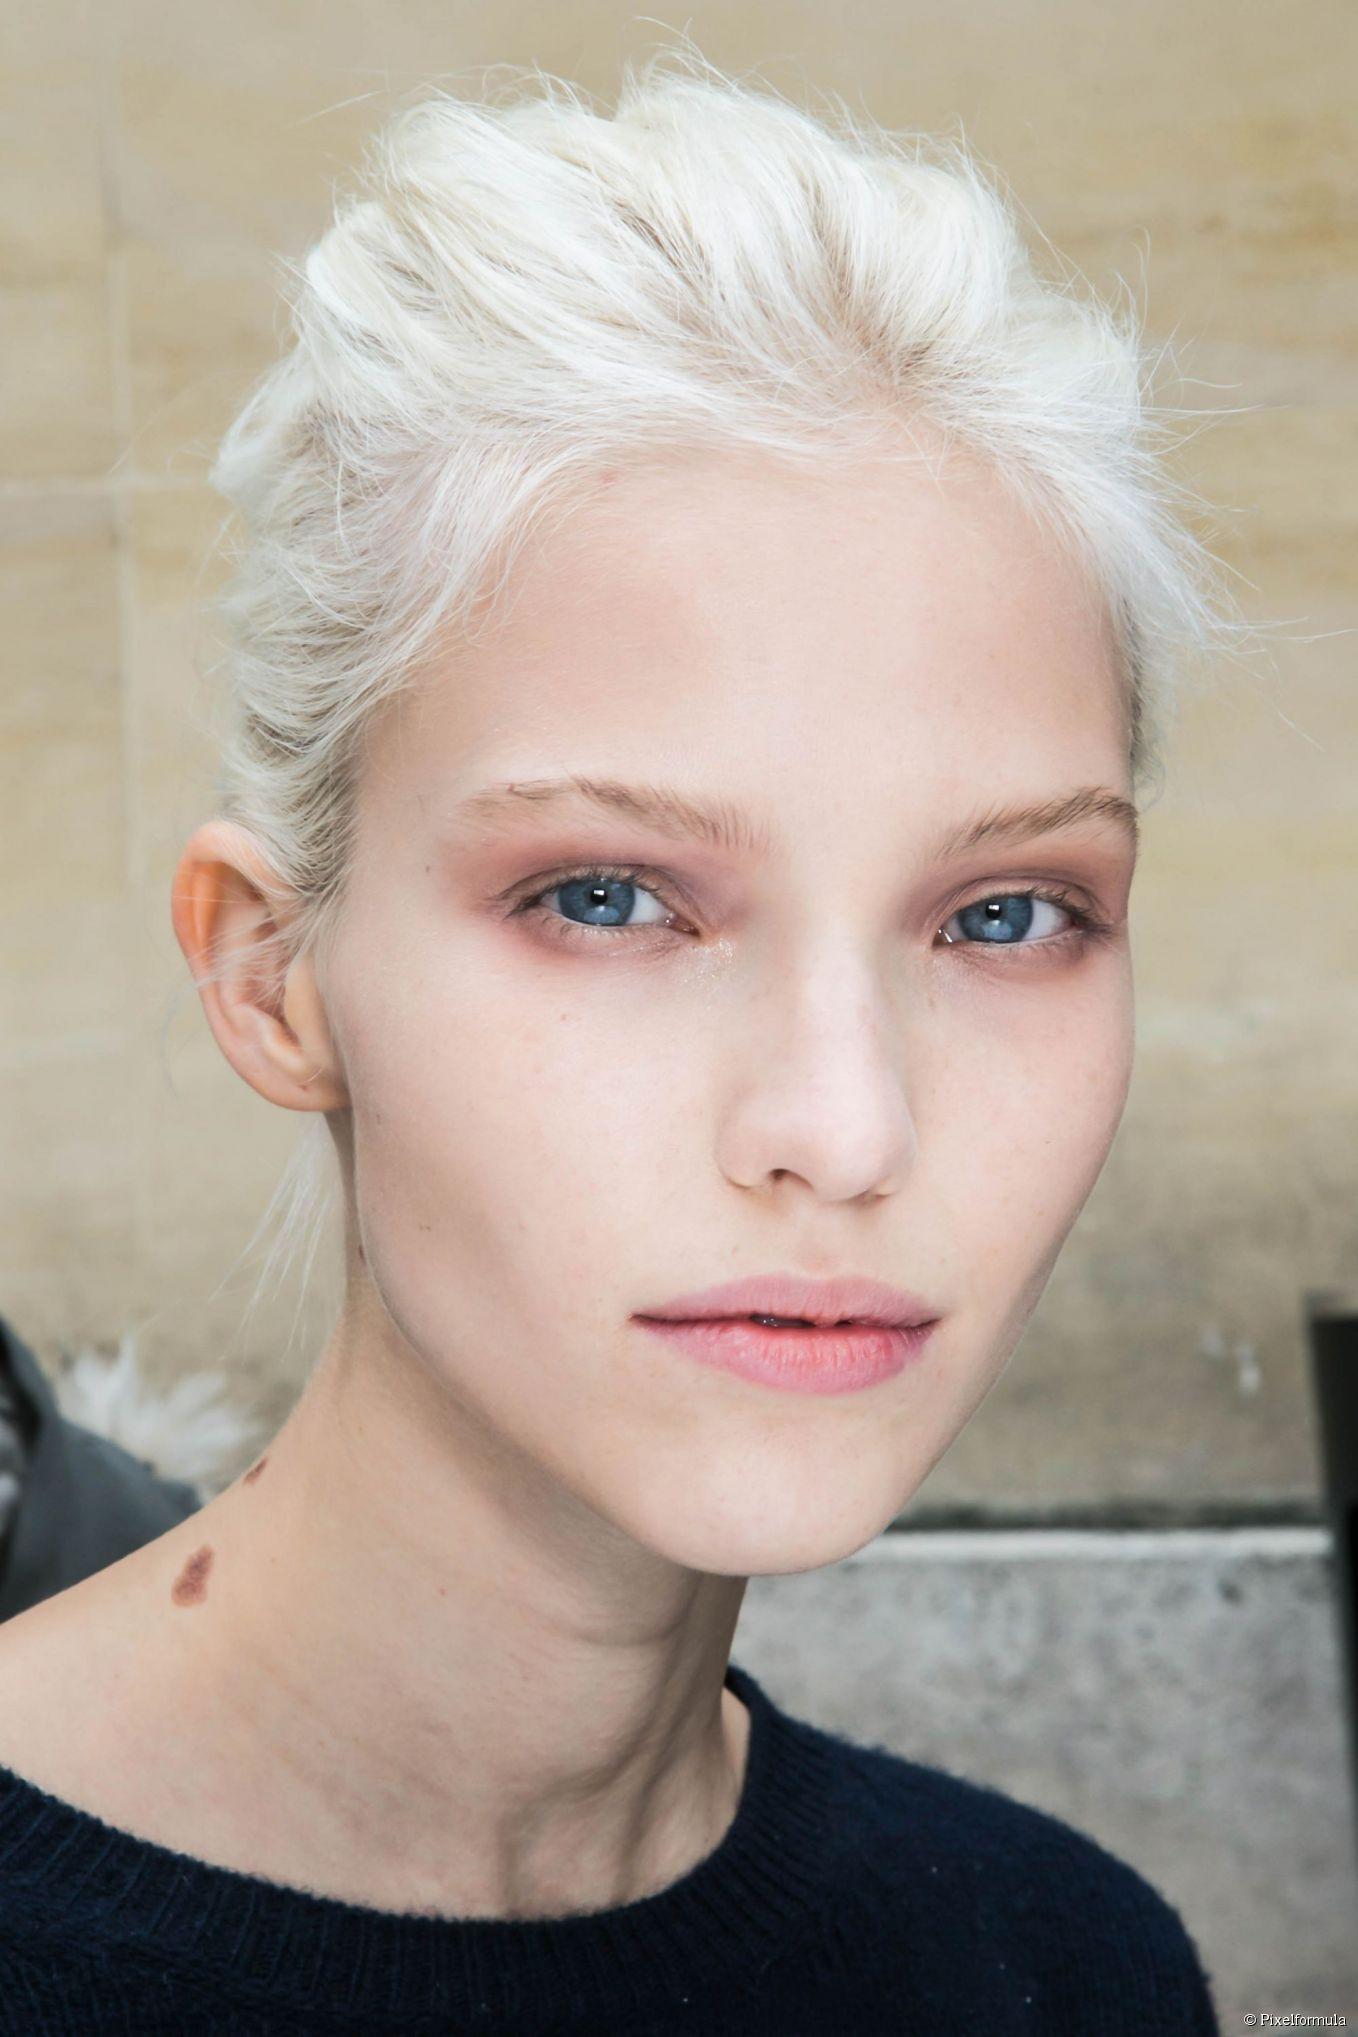 White blonde can look very striking on pale skin Beau